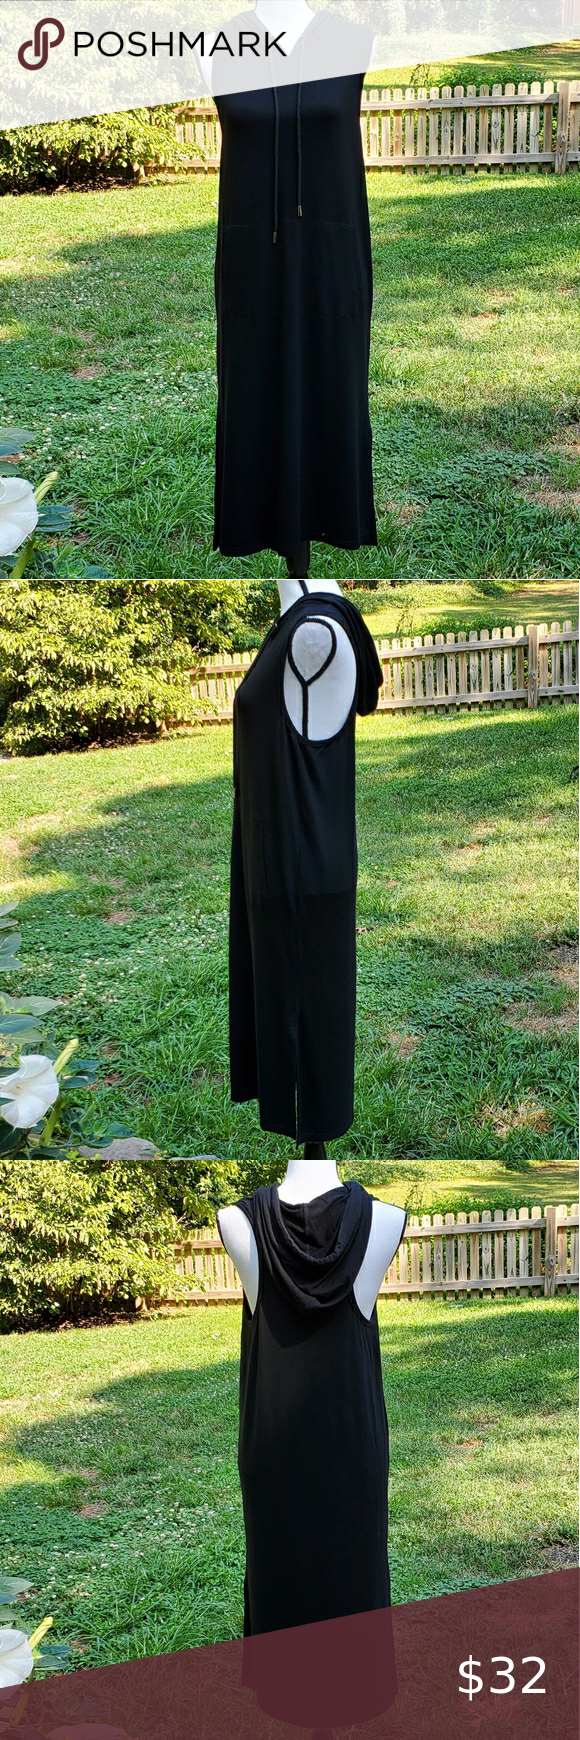 Black T Shirt Hooded Maxi Dress Bobo Small Nwt Bobi Los Angeles Black Hooded Maxi Dress Front Pockets Side Slits Cotton Spandex Black Tshirt Maxi Dress Maxi [ 1740 x 580 Pixel ]